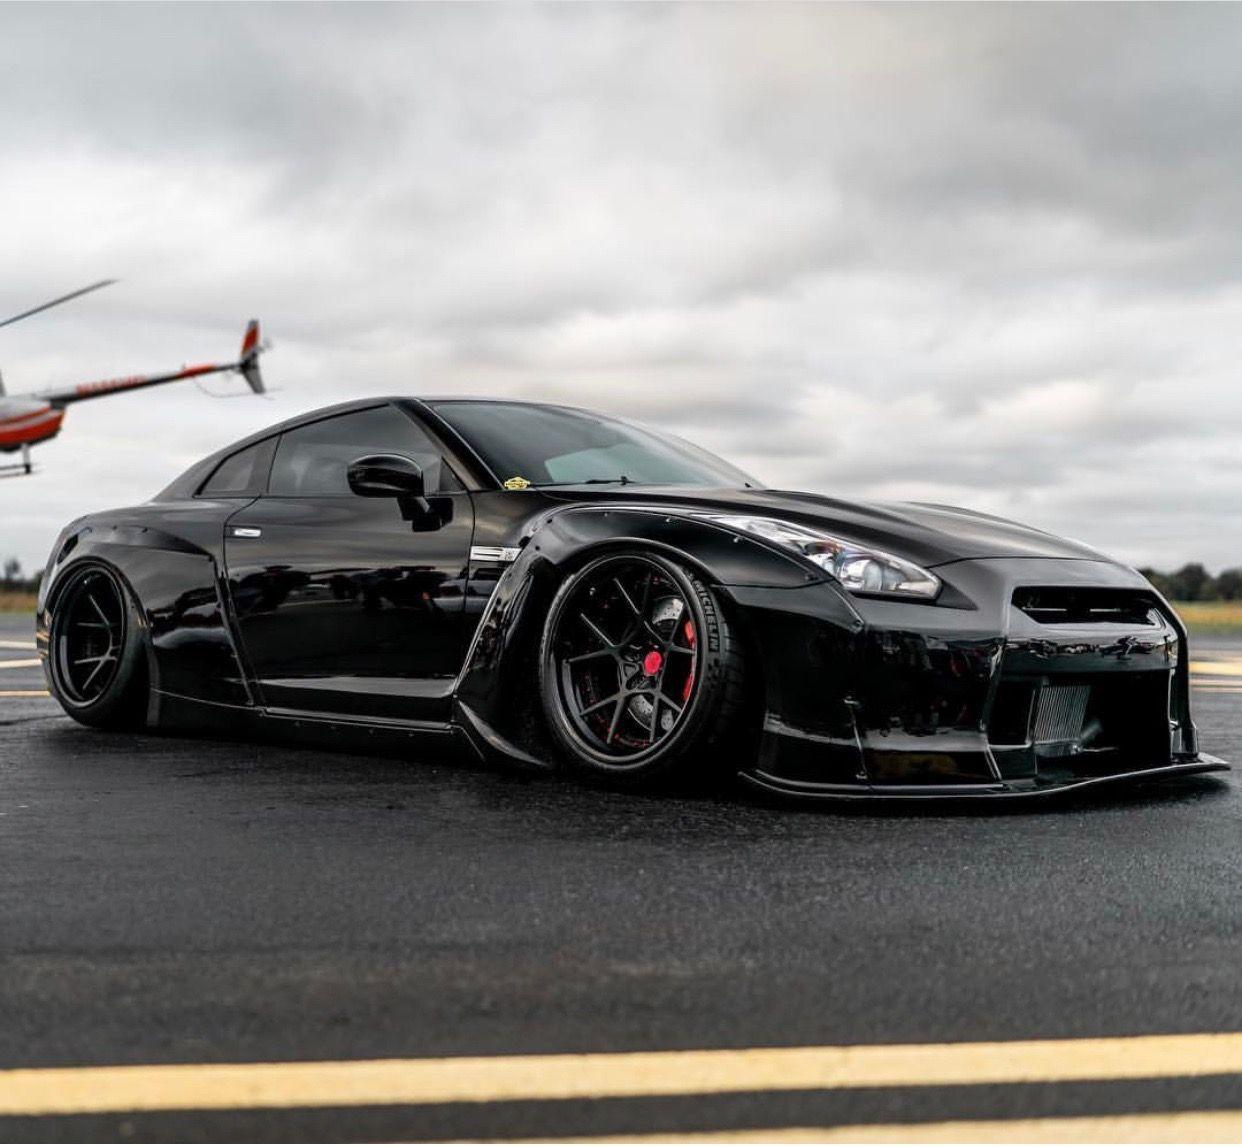 Nissan Gtr, Car Wheels, Gtr